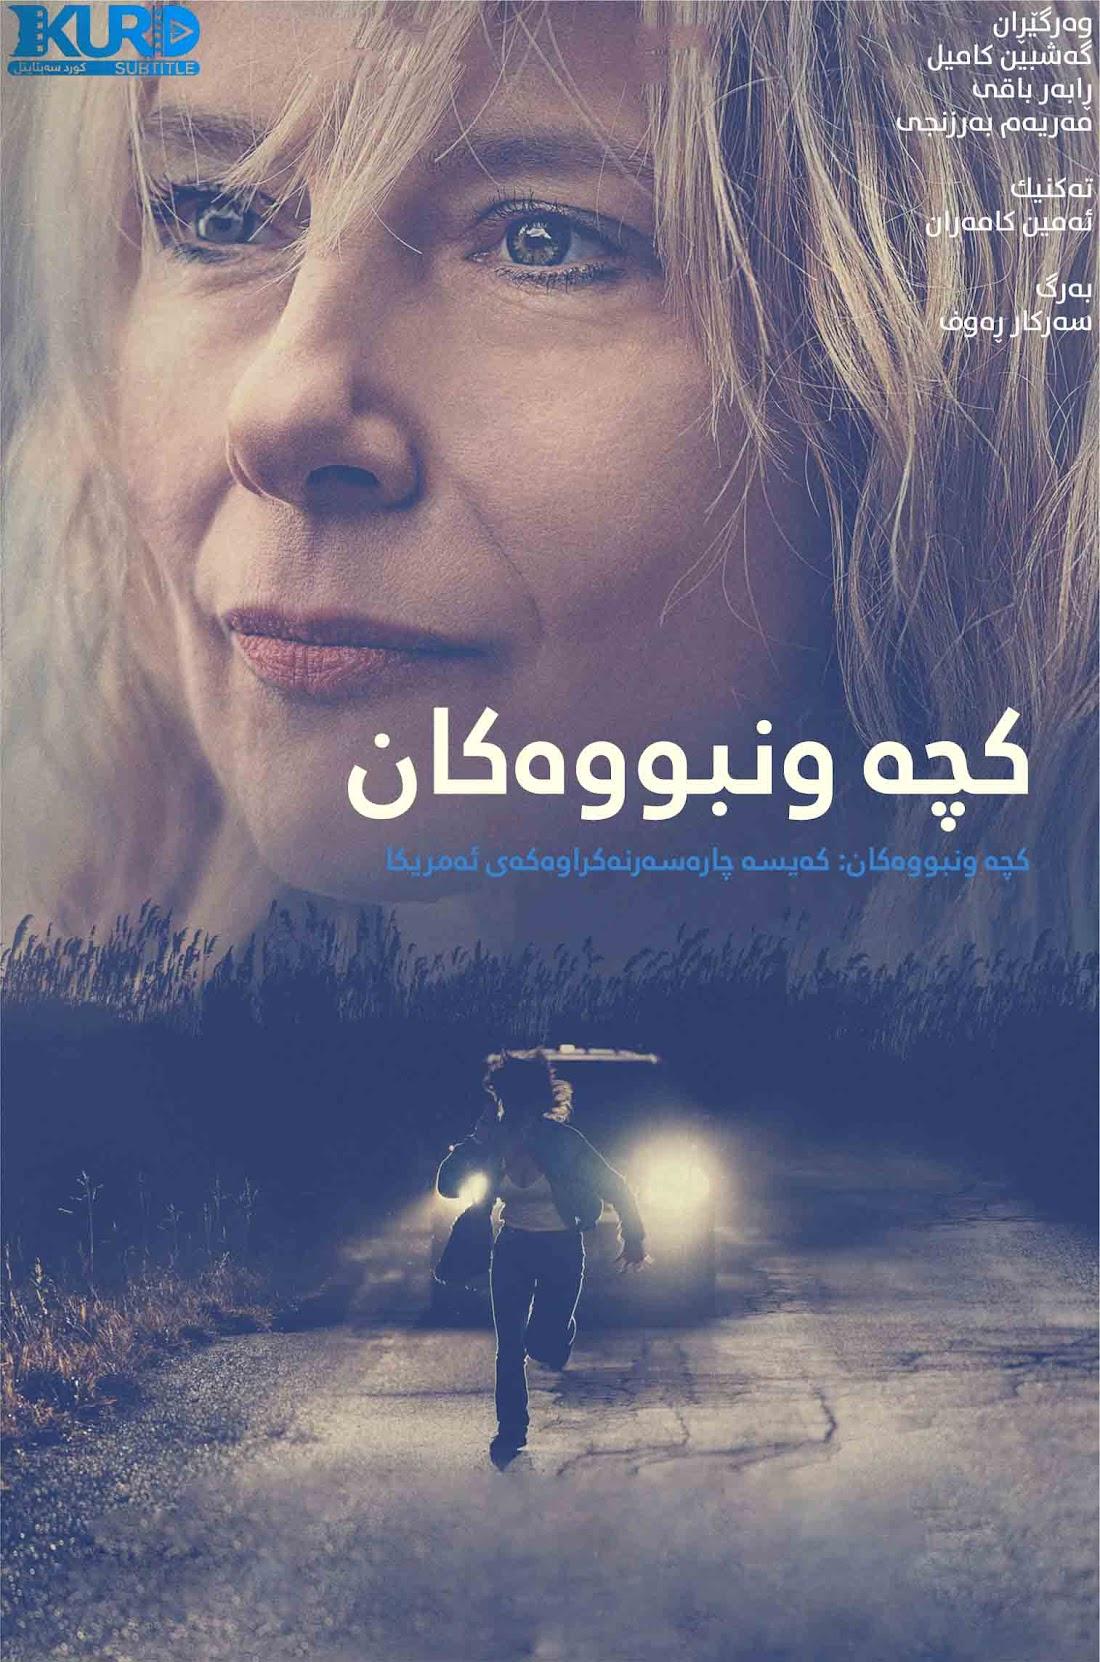 Lost Girls kurdish poster